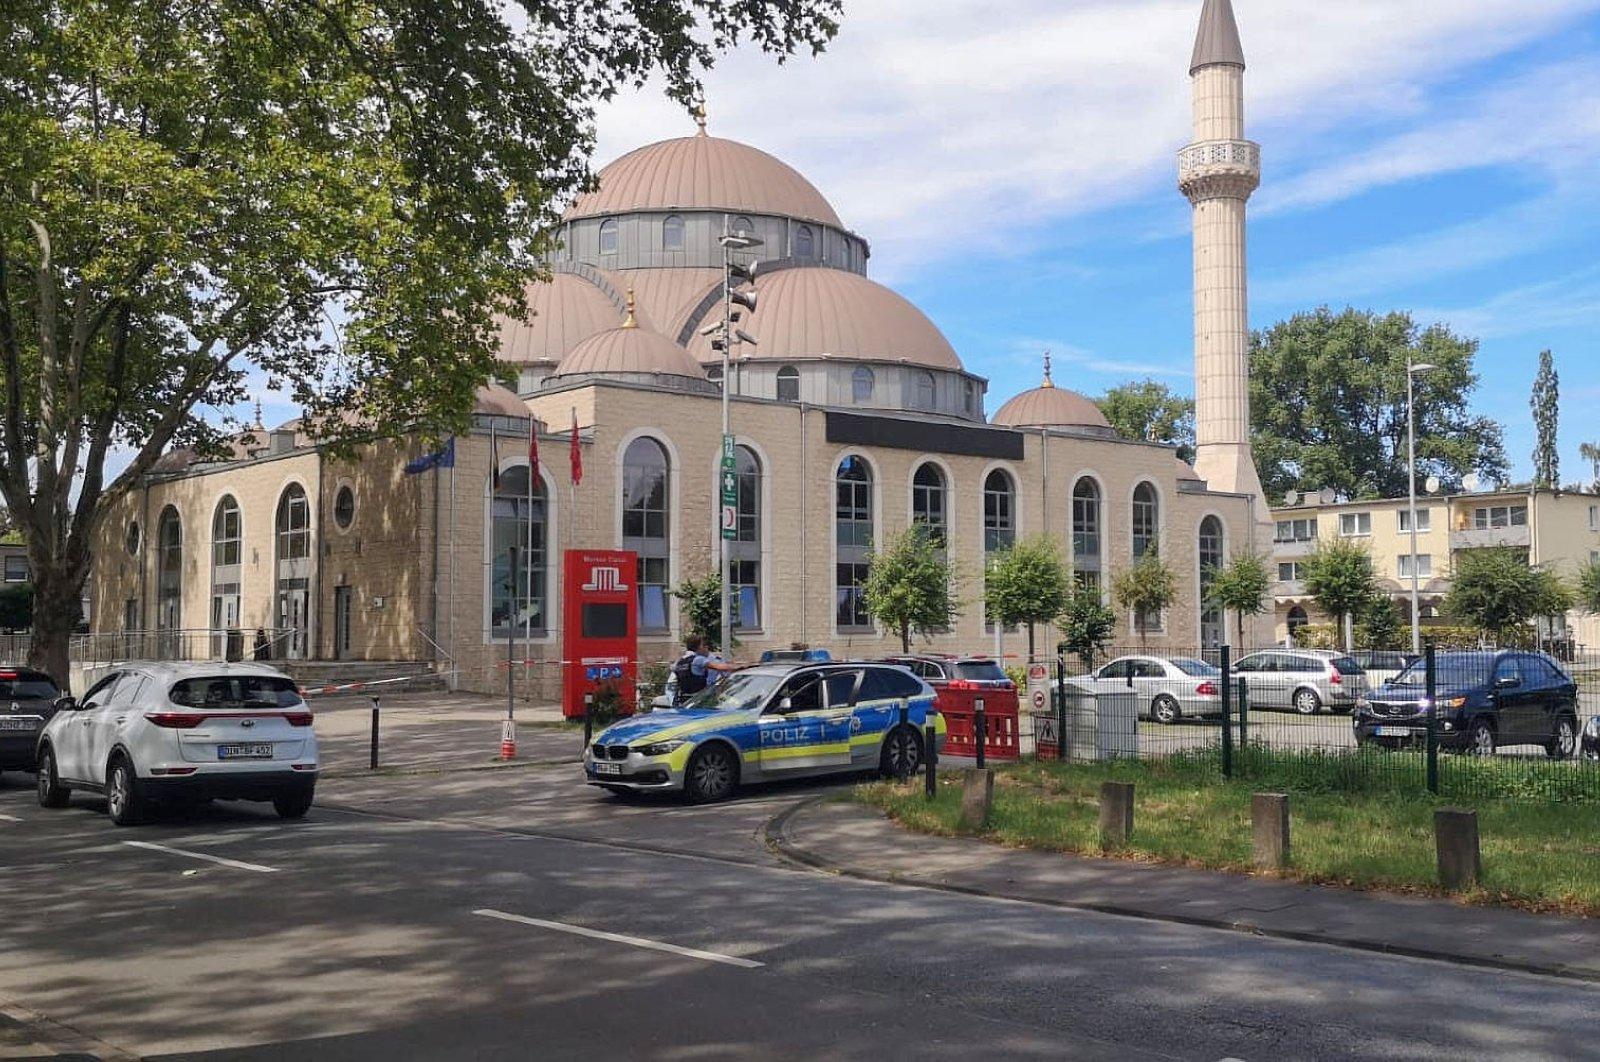 A mosque run by DITIB is seen in Duisburg, North Rhine-Westphalia, Germany, July 23, 2019. (AA Photo)